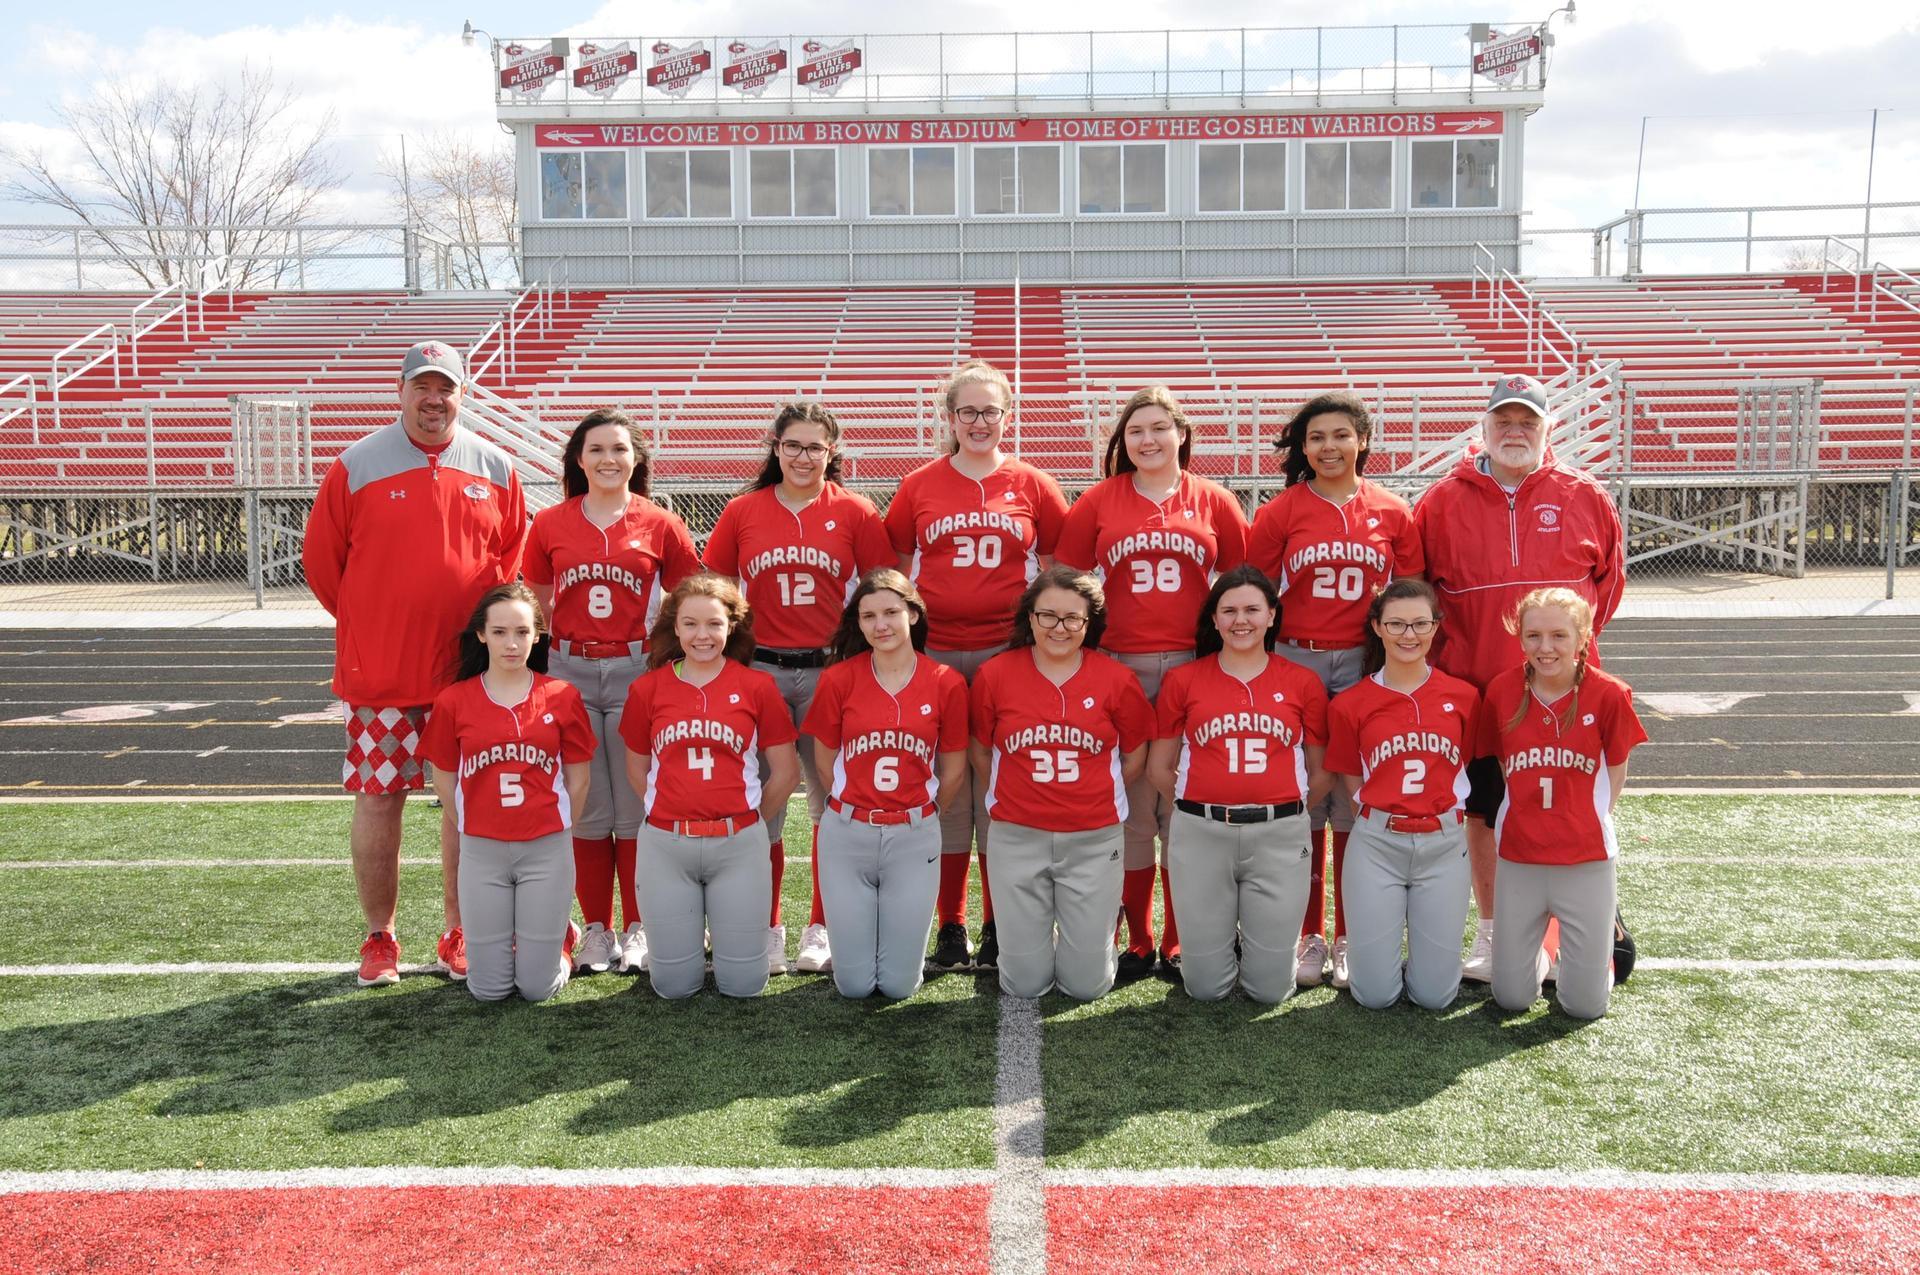 2019 Girls JV Softball